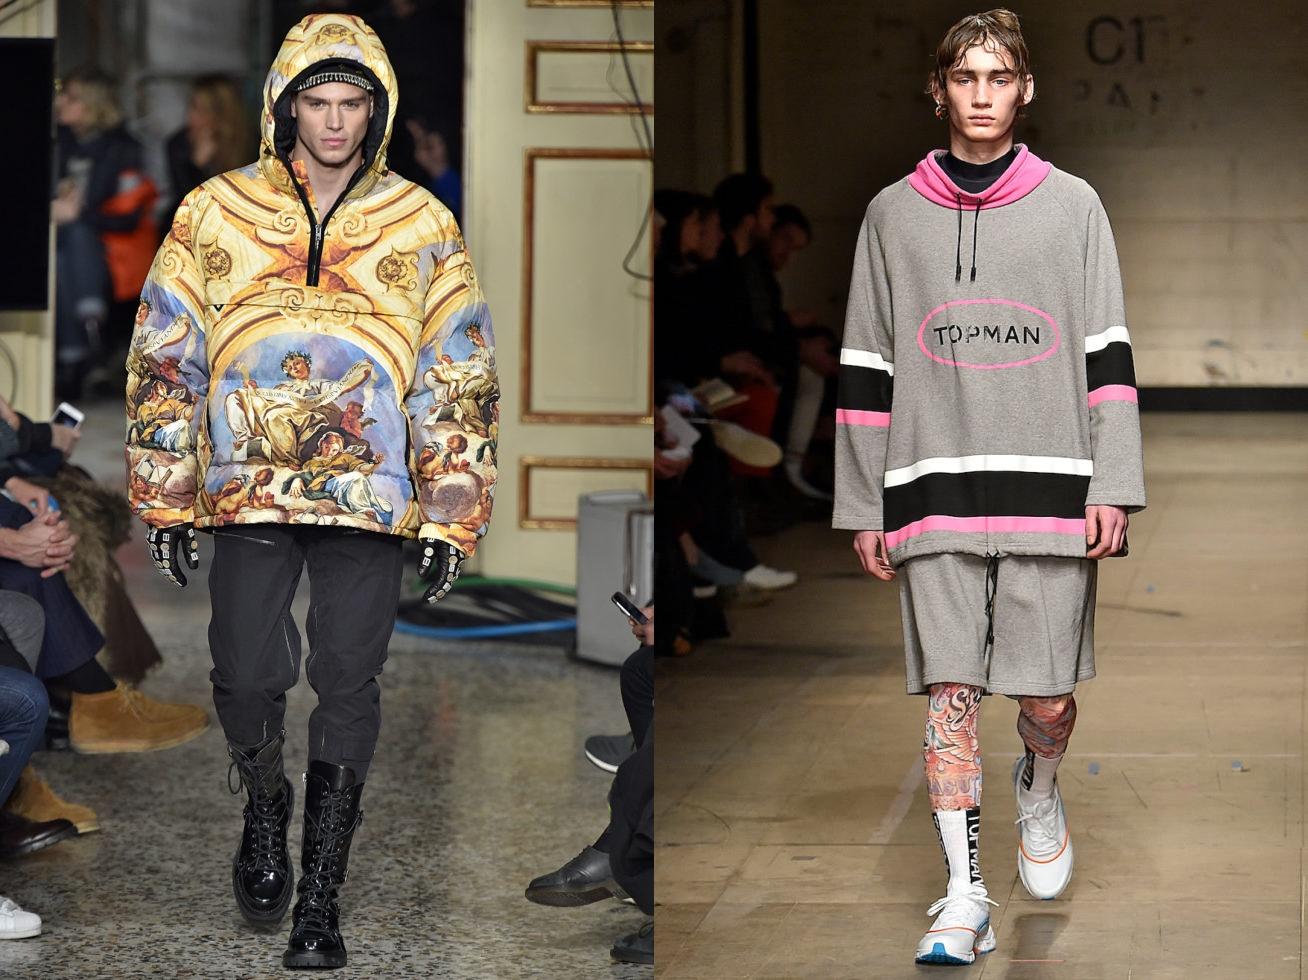 Street Style Masculino | Tendência Masculina 2017 | Blog de Moda Masculina |Dicas de Moda Para Homens